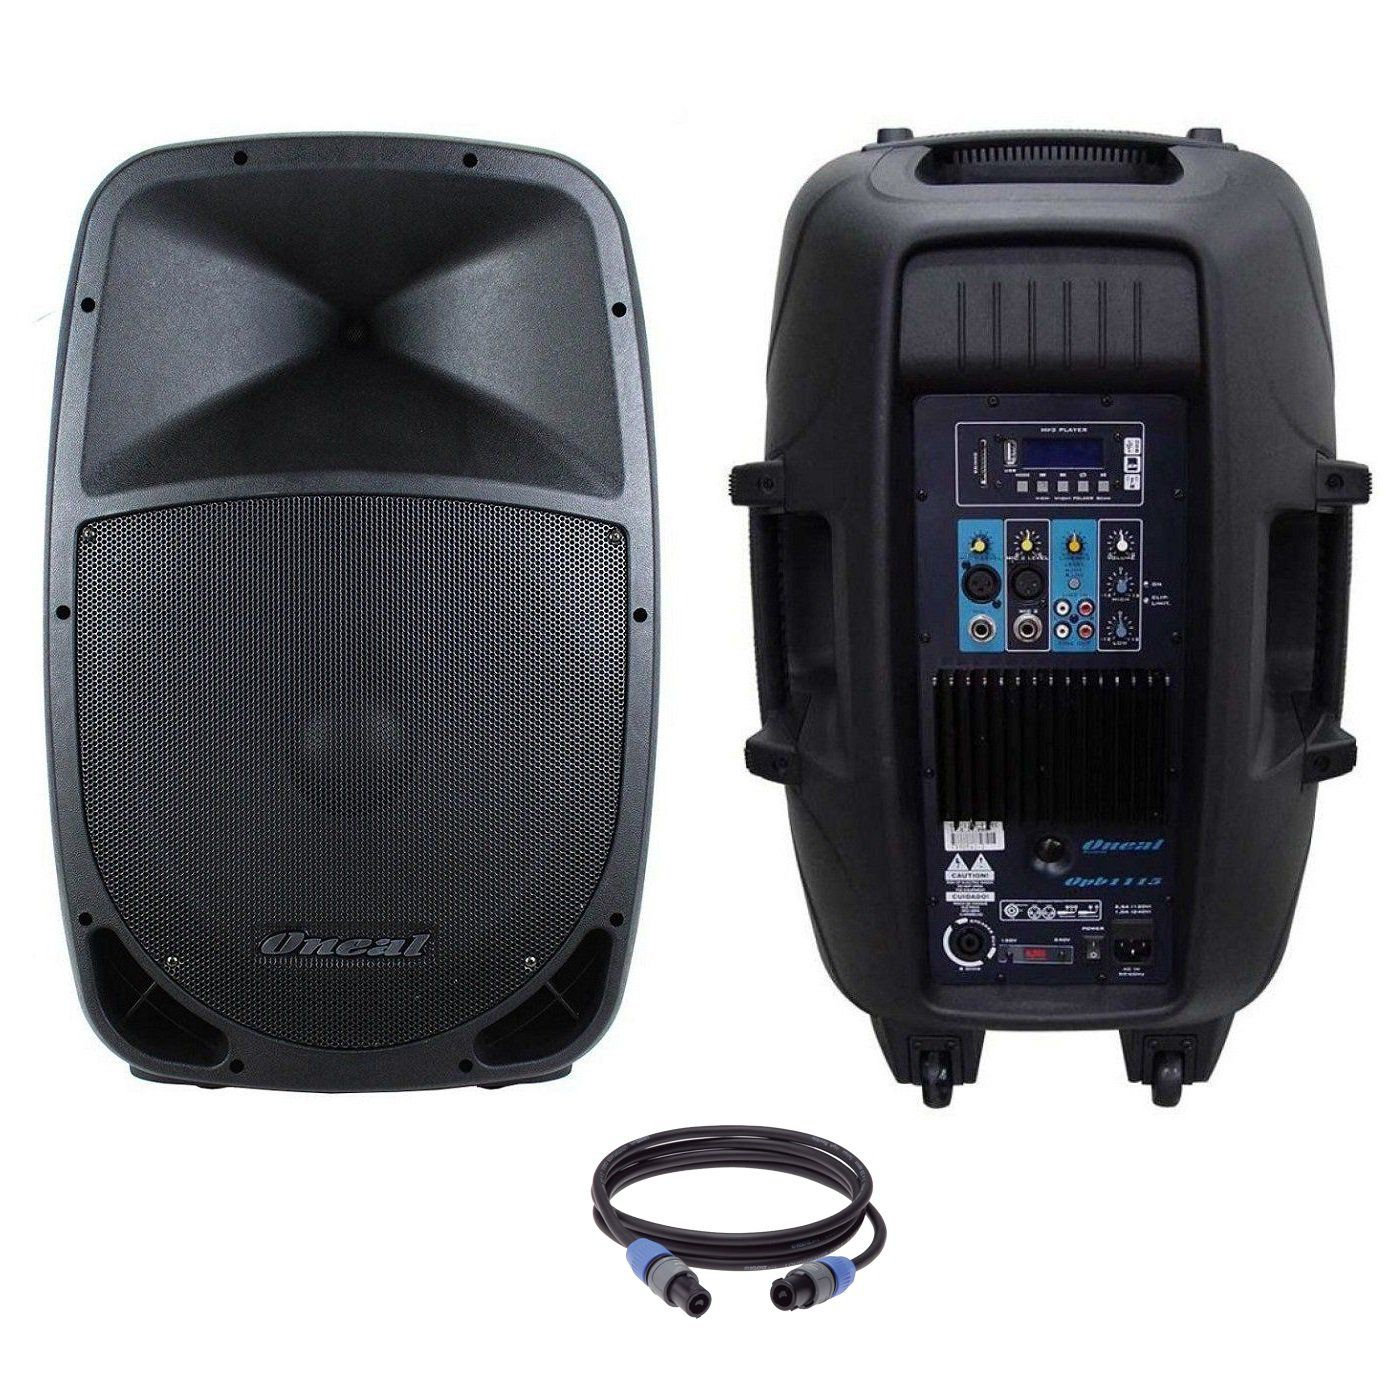 Kit Caixa De Som Oneal Bluetooth Ativa Passiva Opb1115 Ob1115 495w Rms